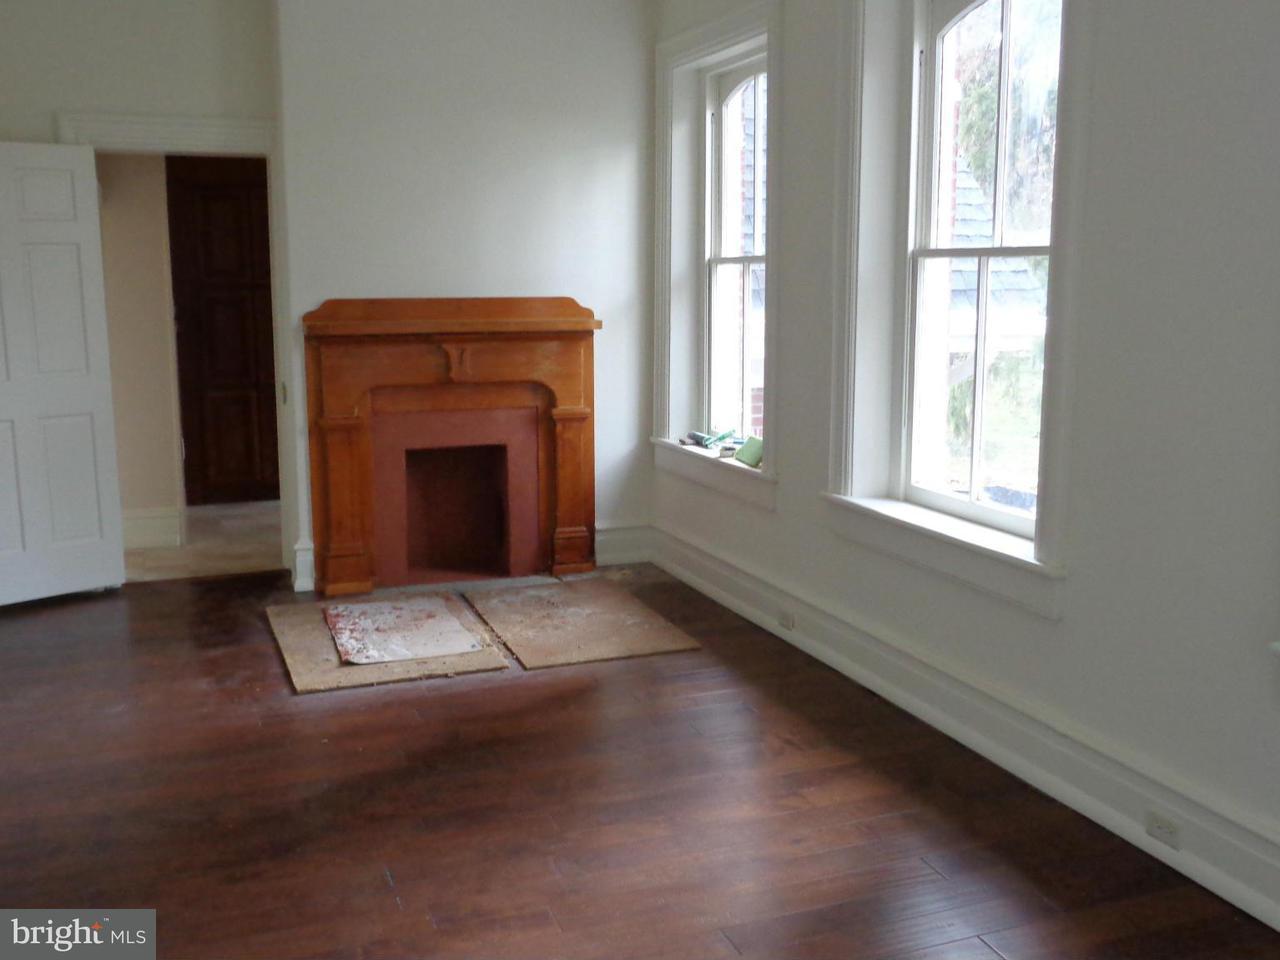 Vivienda unifamiliar por un Venta en 213 Prince Street 213 Prince Street Shippensburg, Pennsylvania 17257 Estados Unidos